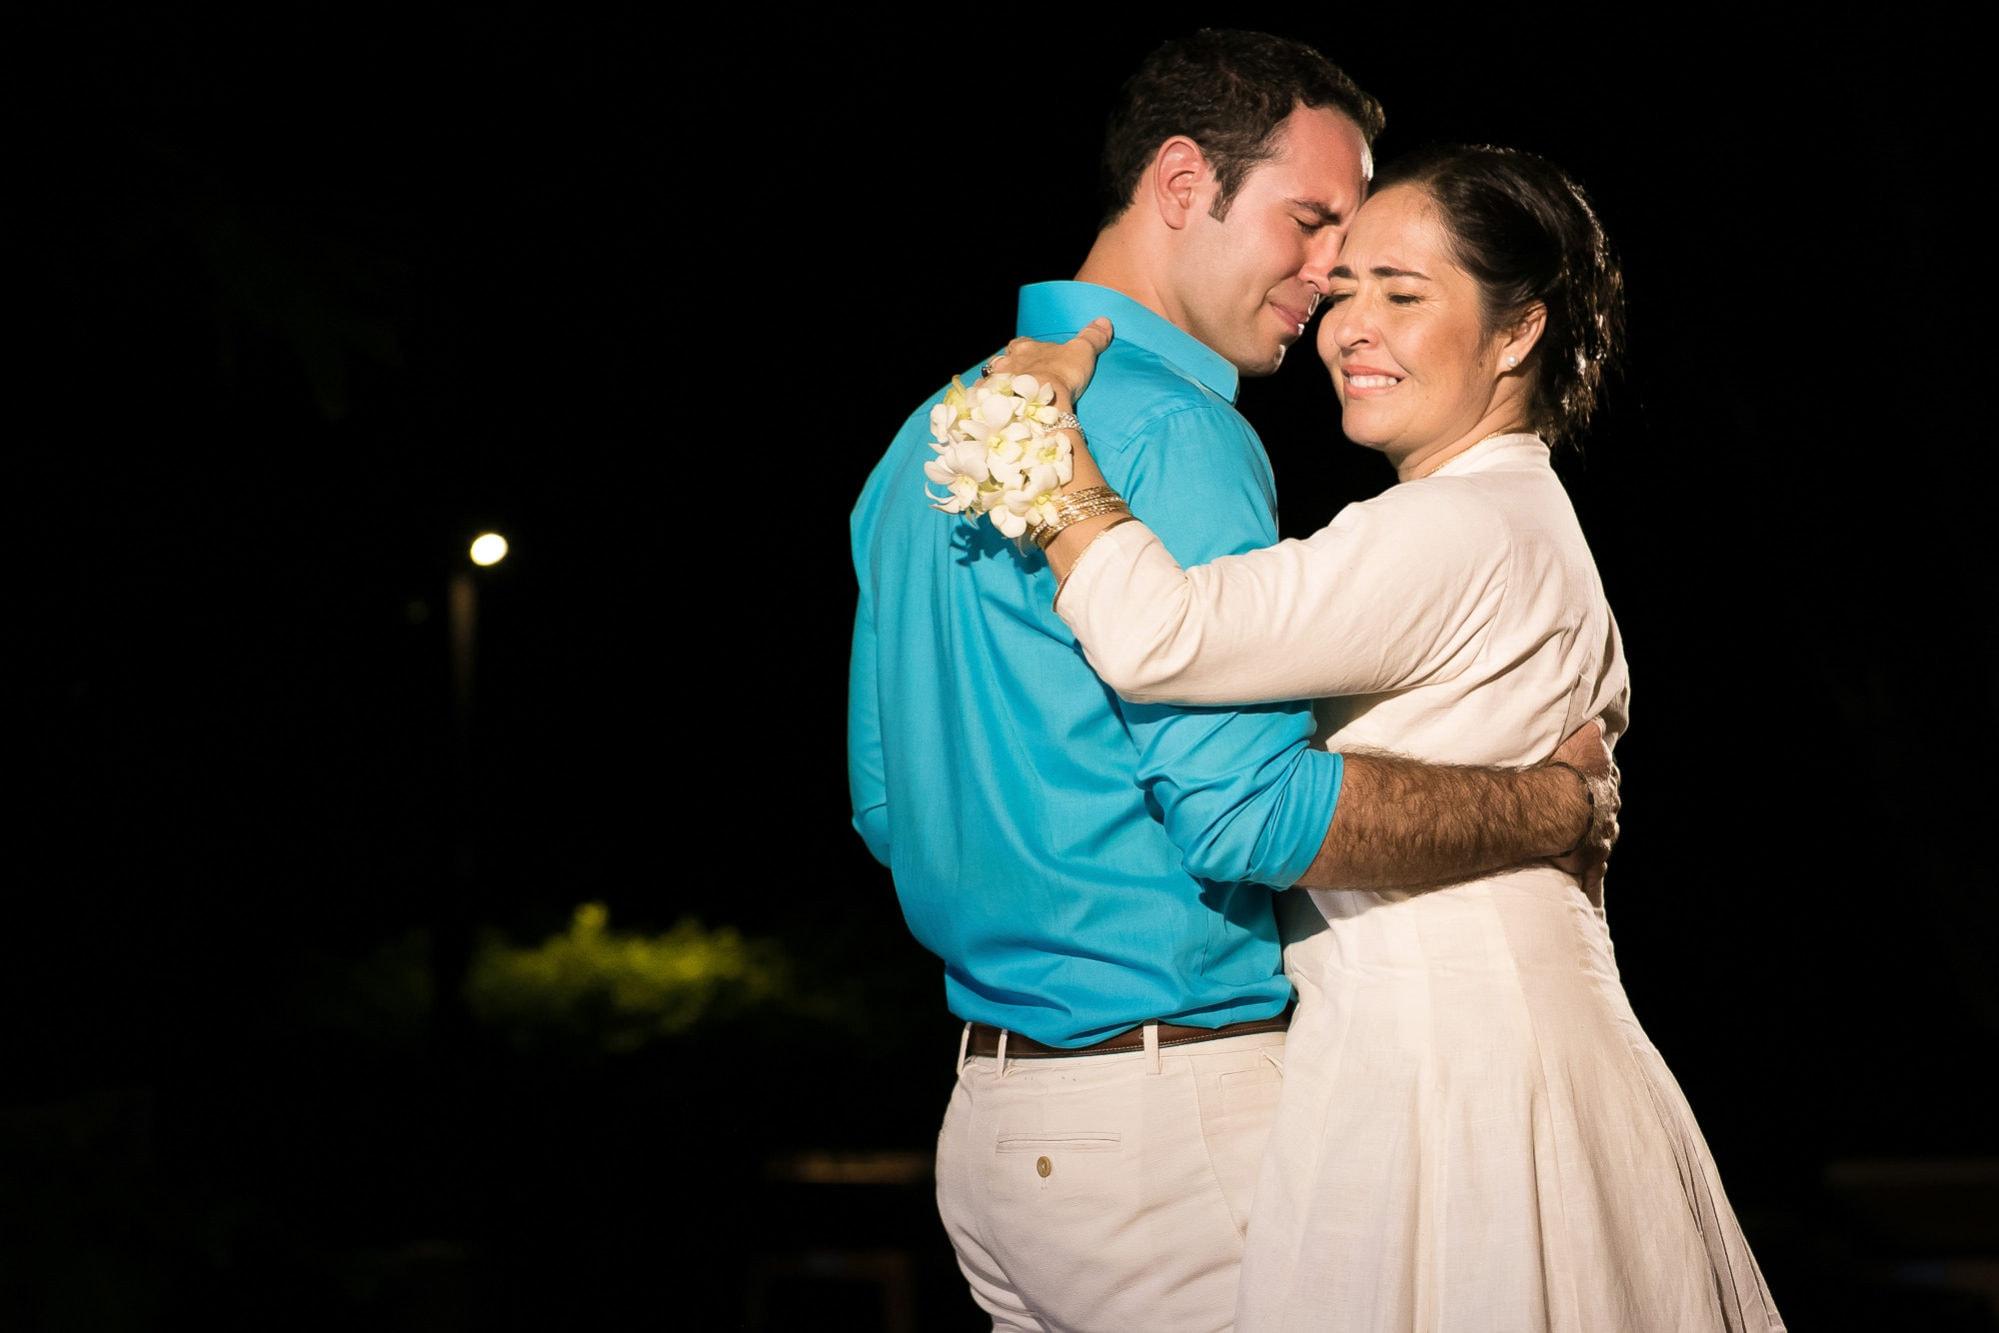 mother son dance wedding costa rica